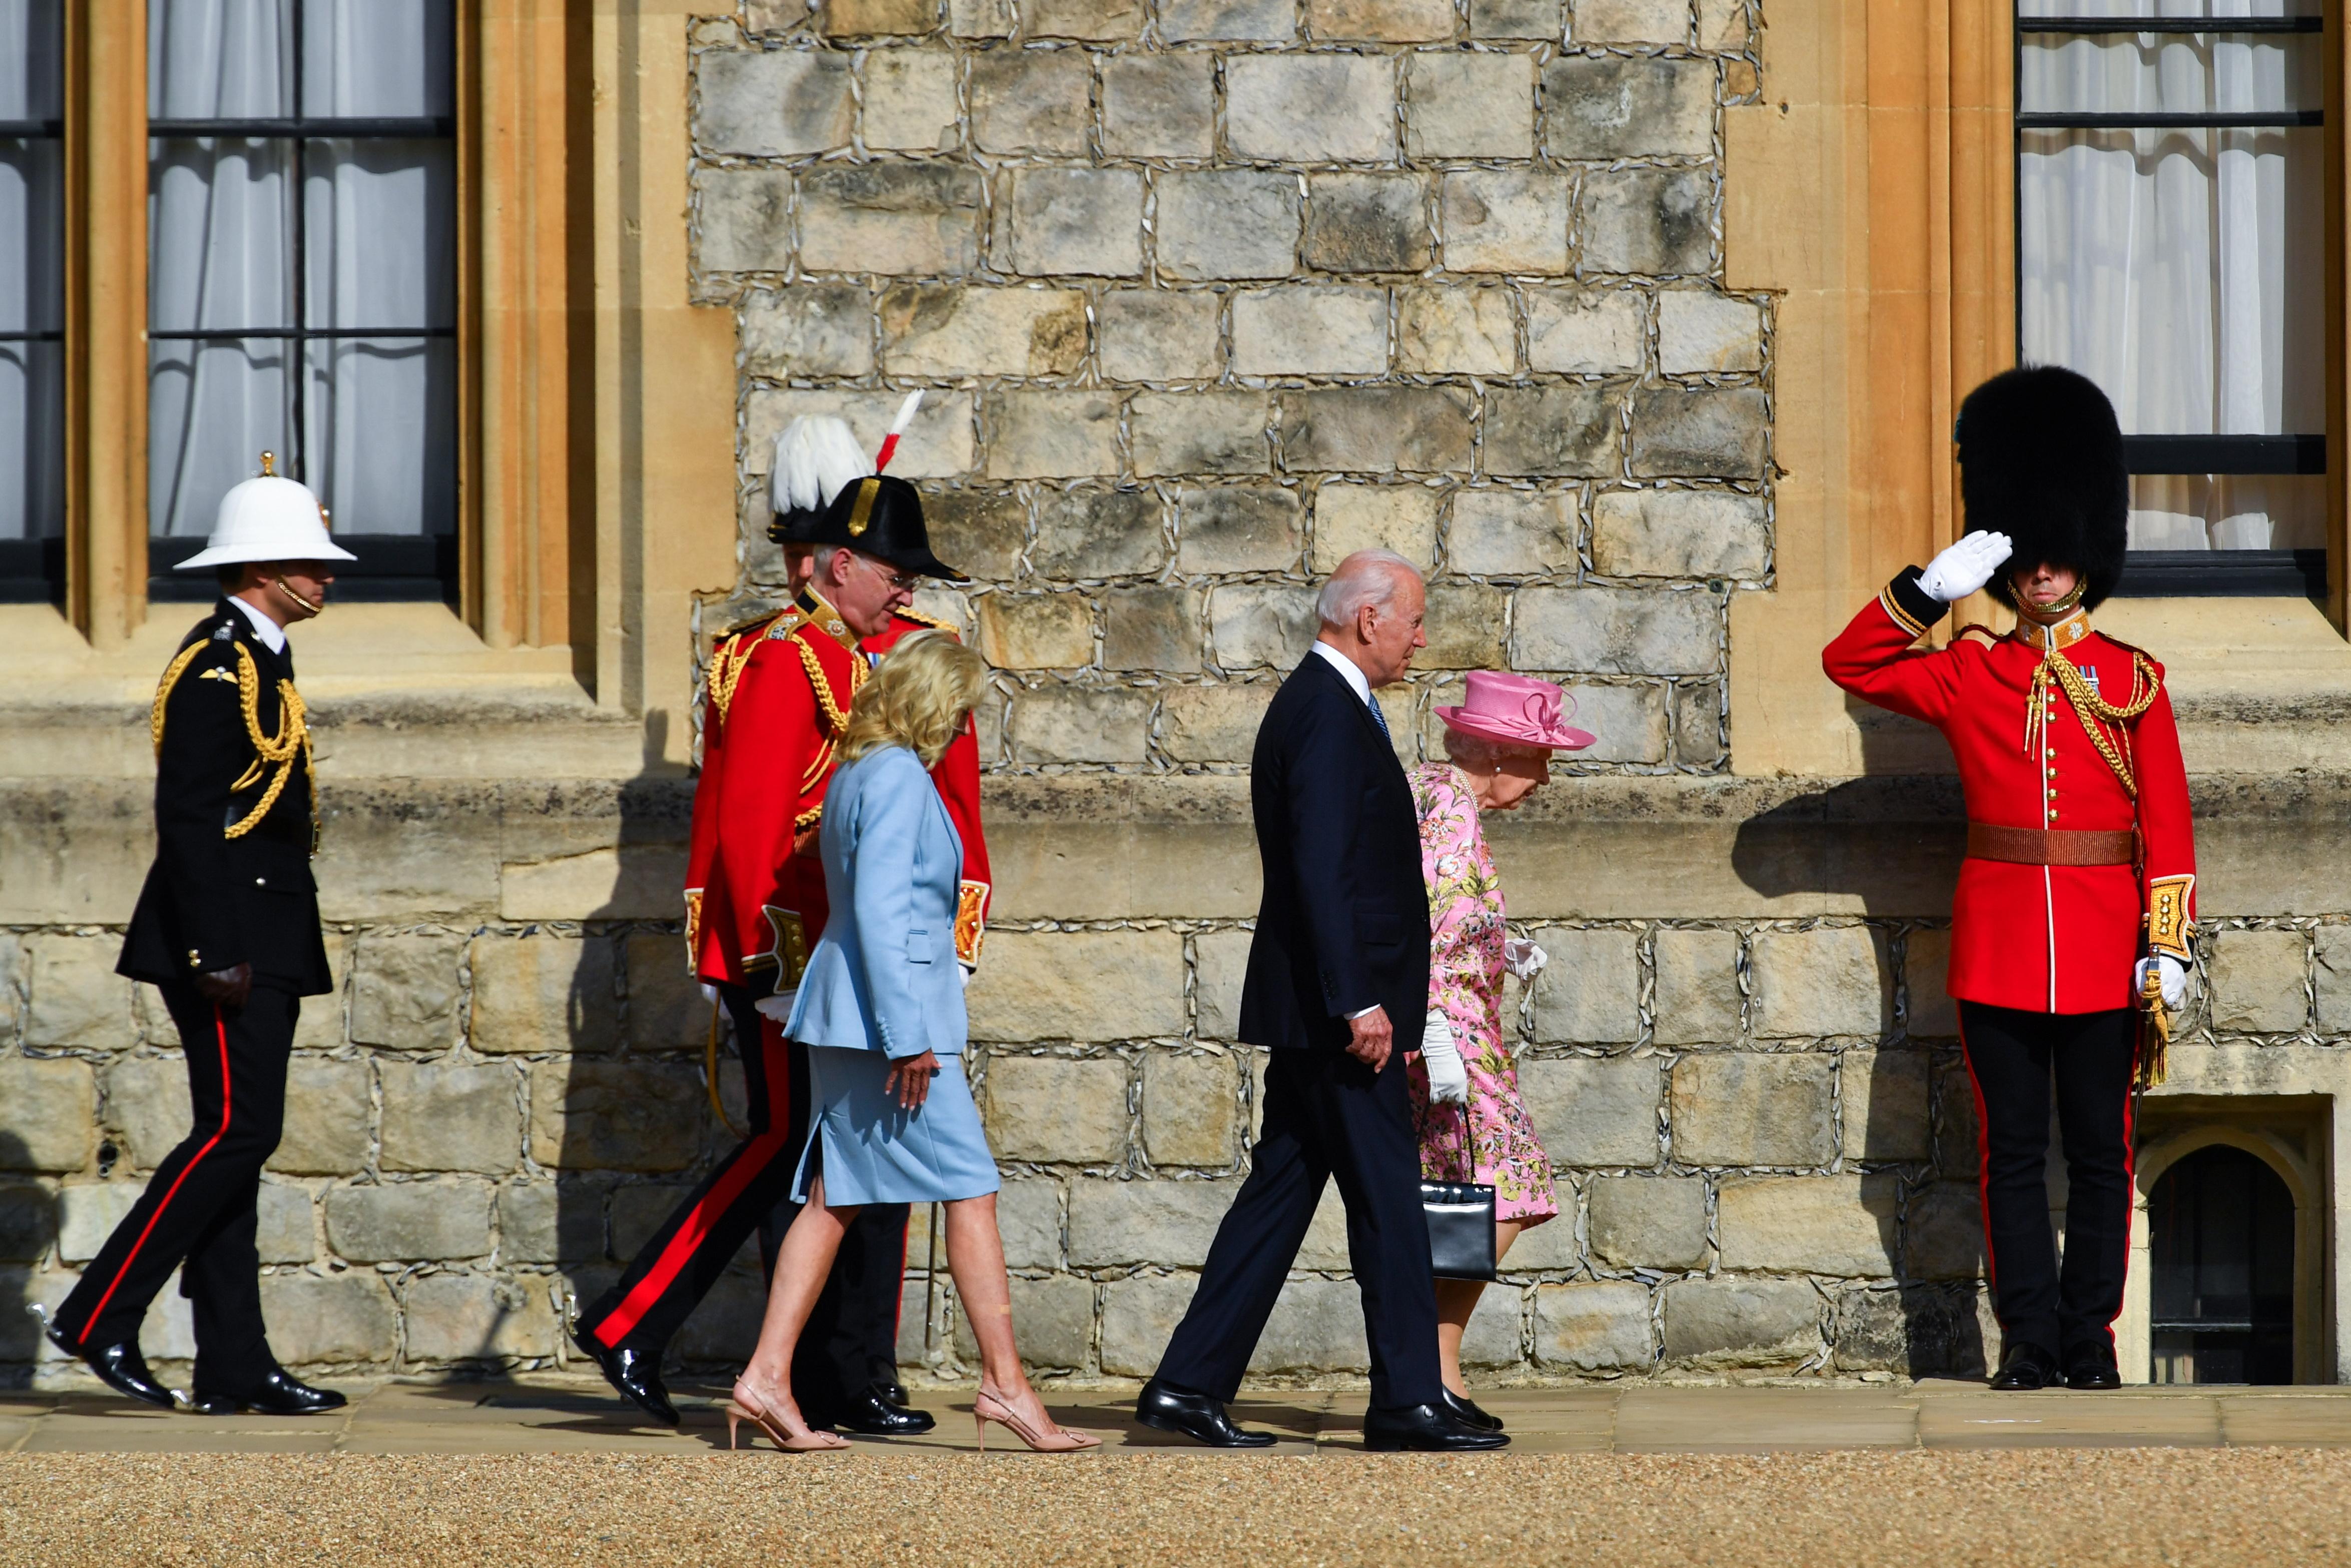 U.S. President Joe Biden and first lady Jill Biden walk next to Britain's Queen Elizabeth, at Windsor Castle in Windsor, Britain, June 13, 2021. REUTERS/Dylan Martinez